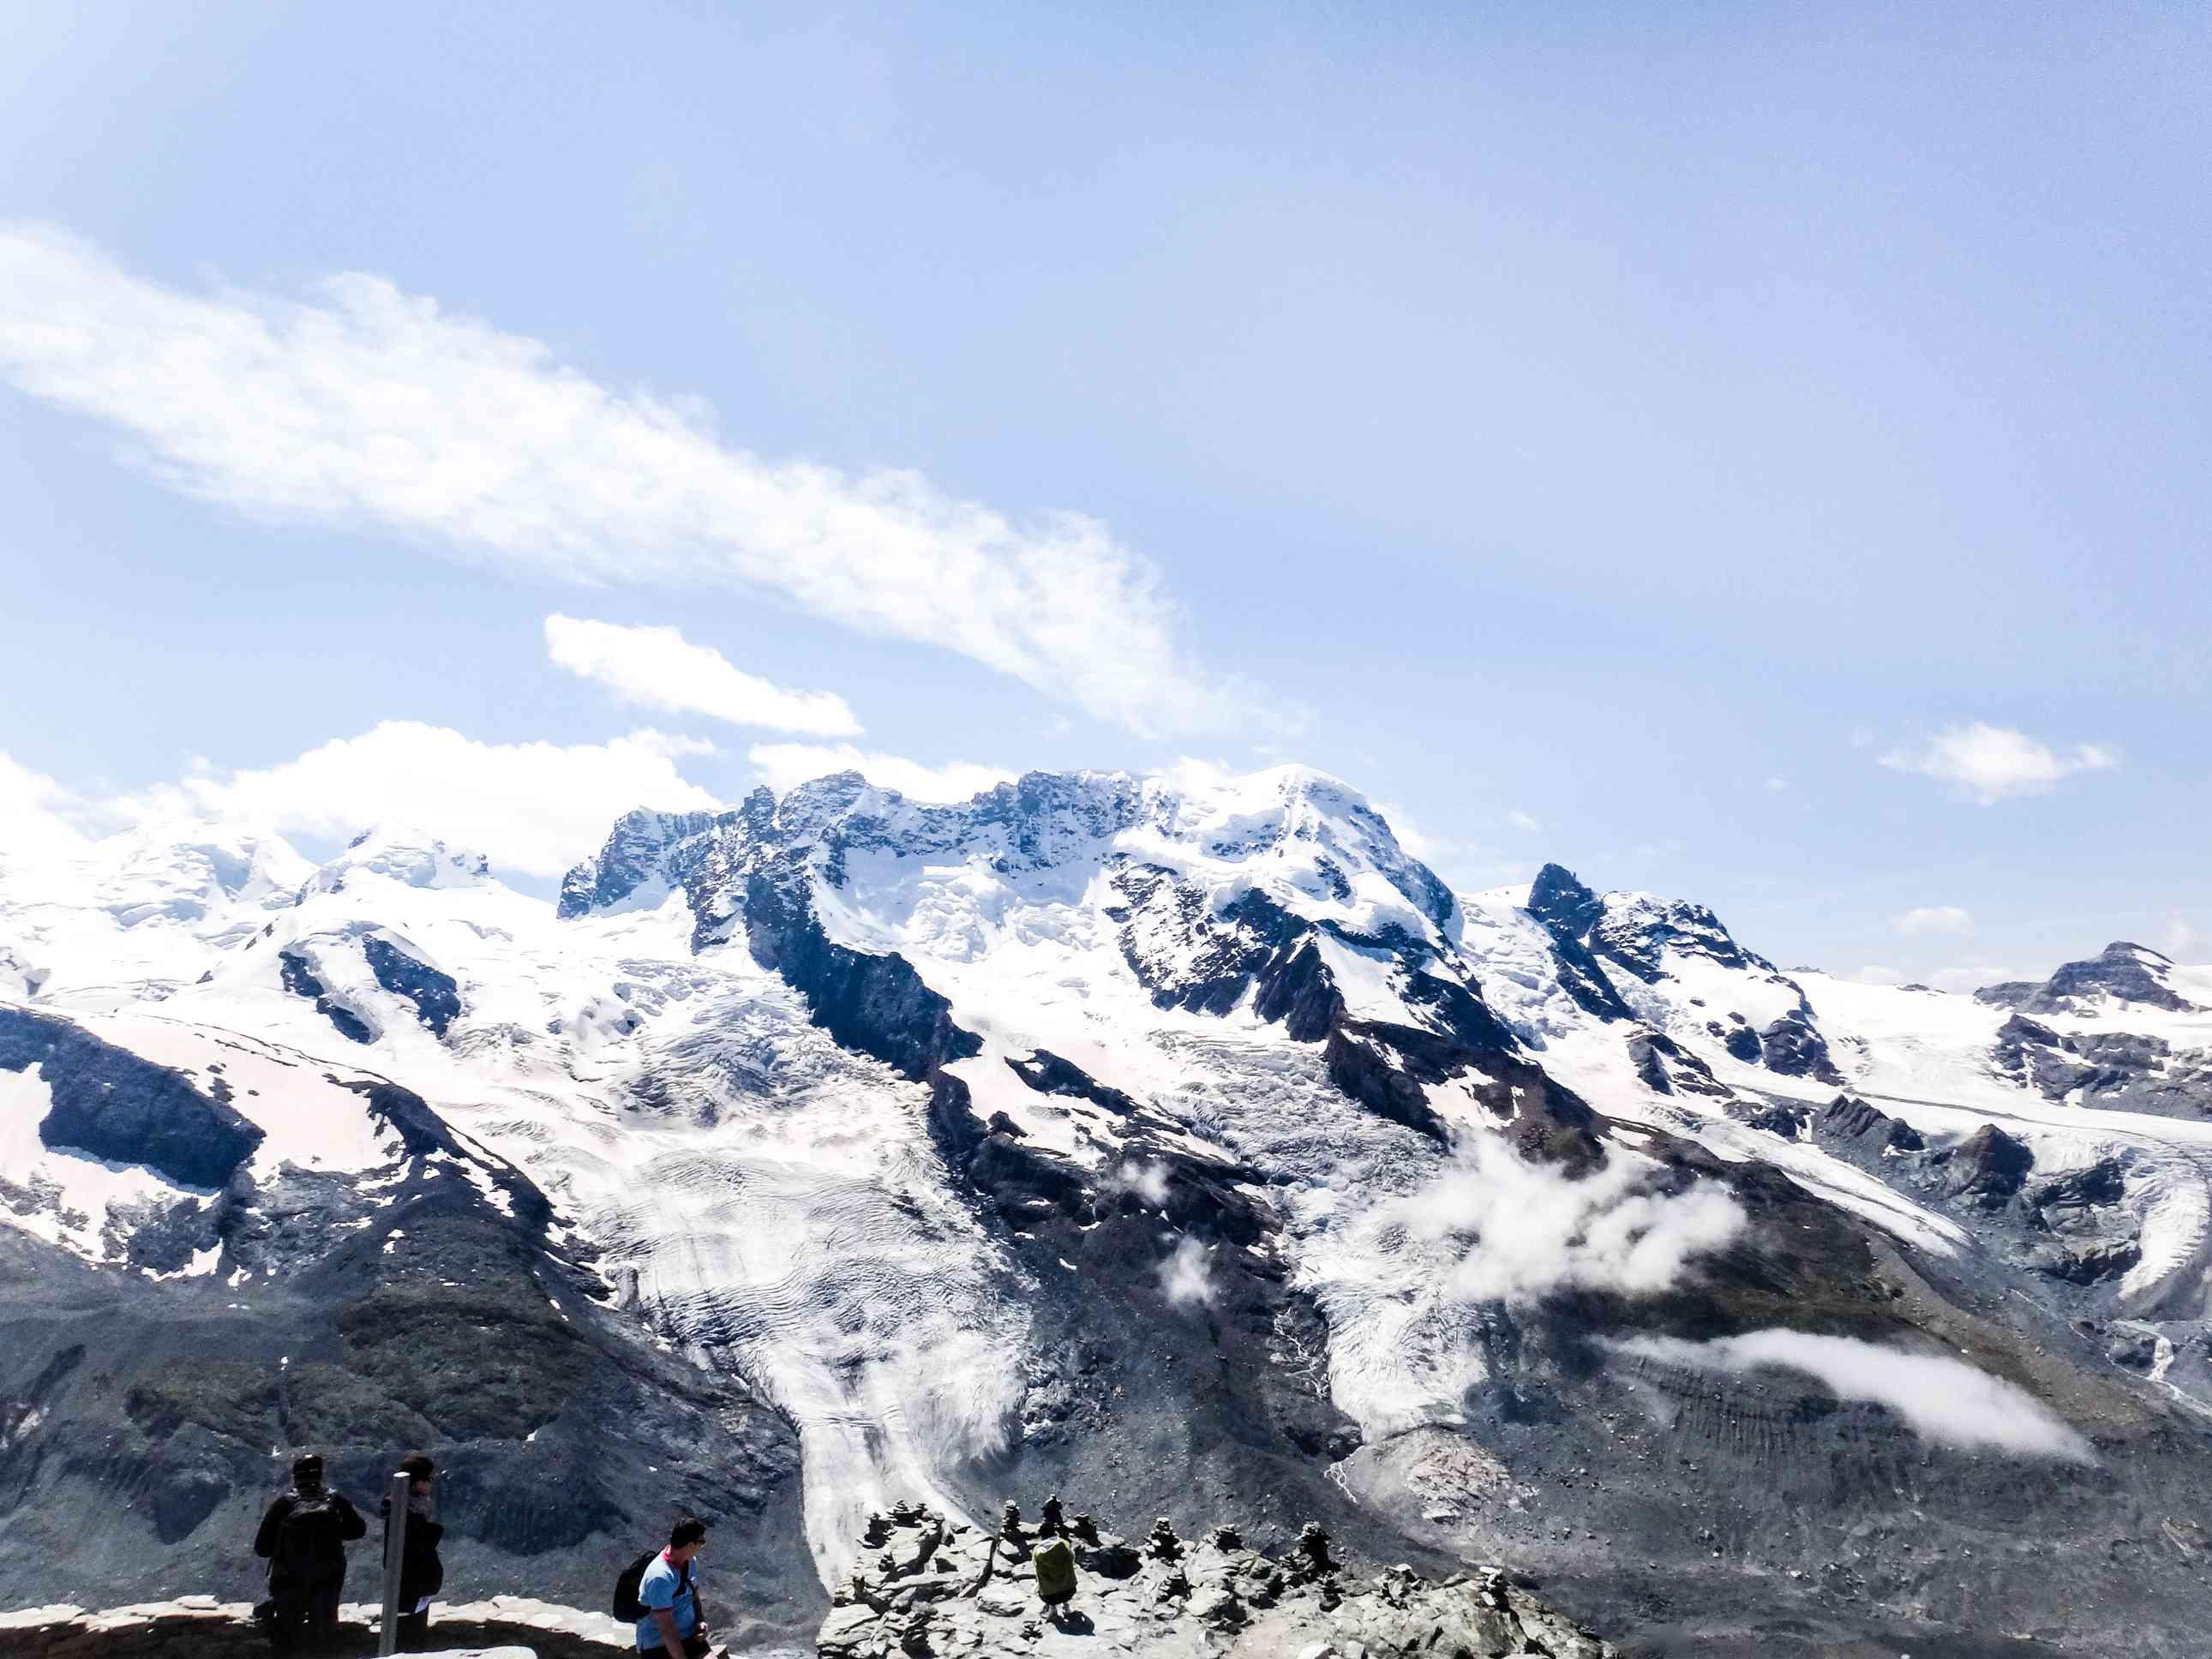 Snowy mountain tops of Zermatt